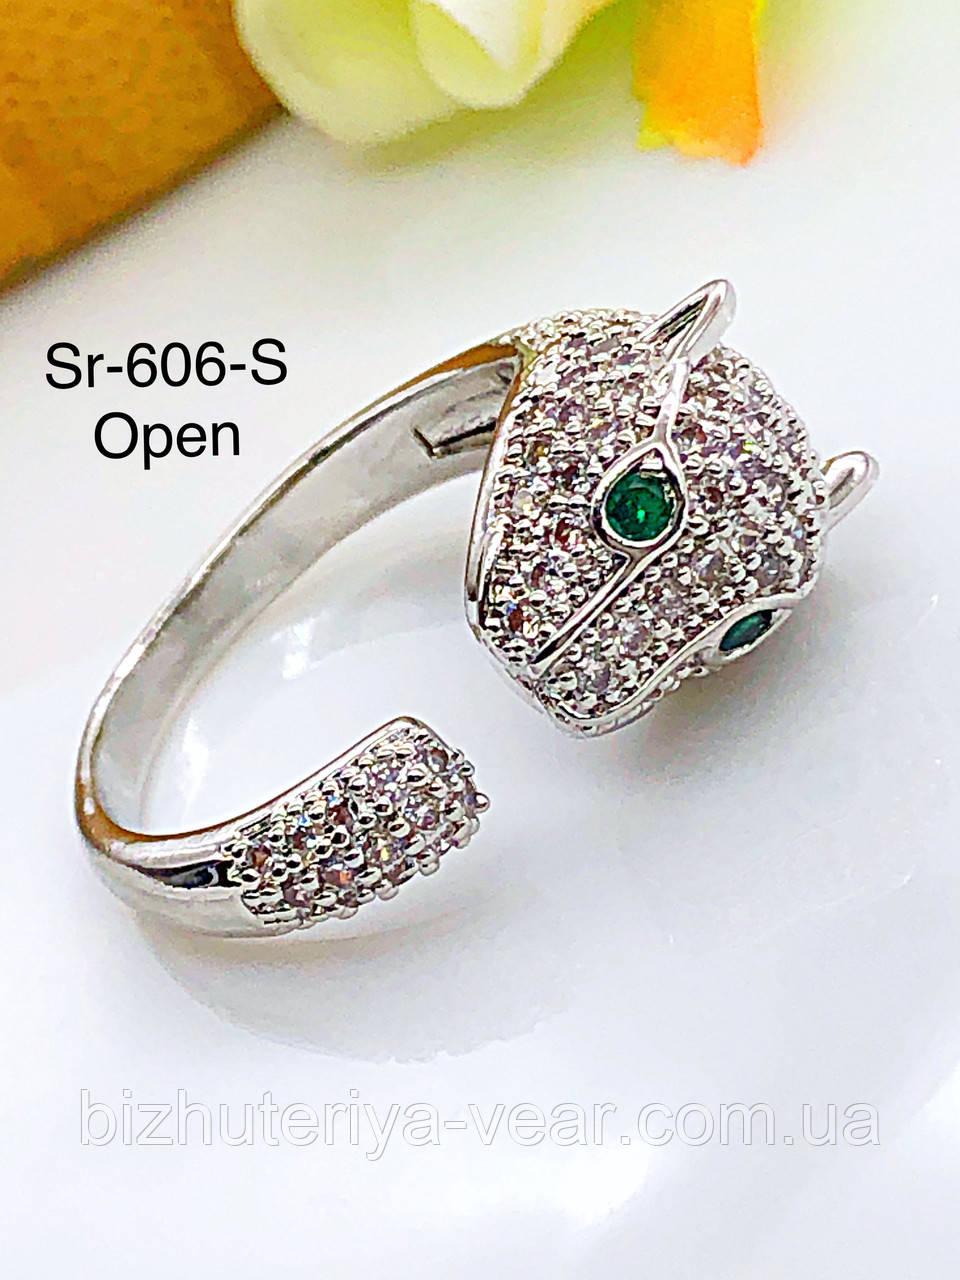 КОЛЬЦО STAINLEES STEEL Sr-606 open